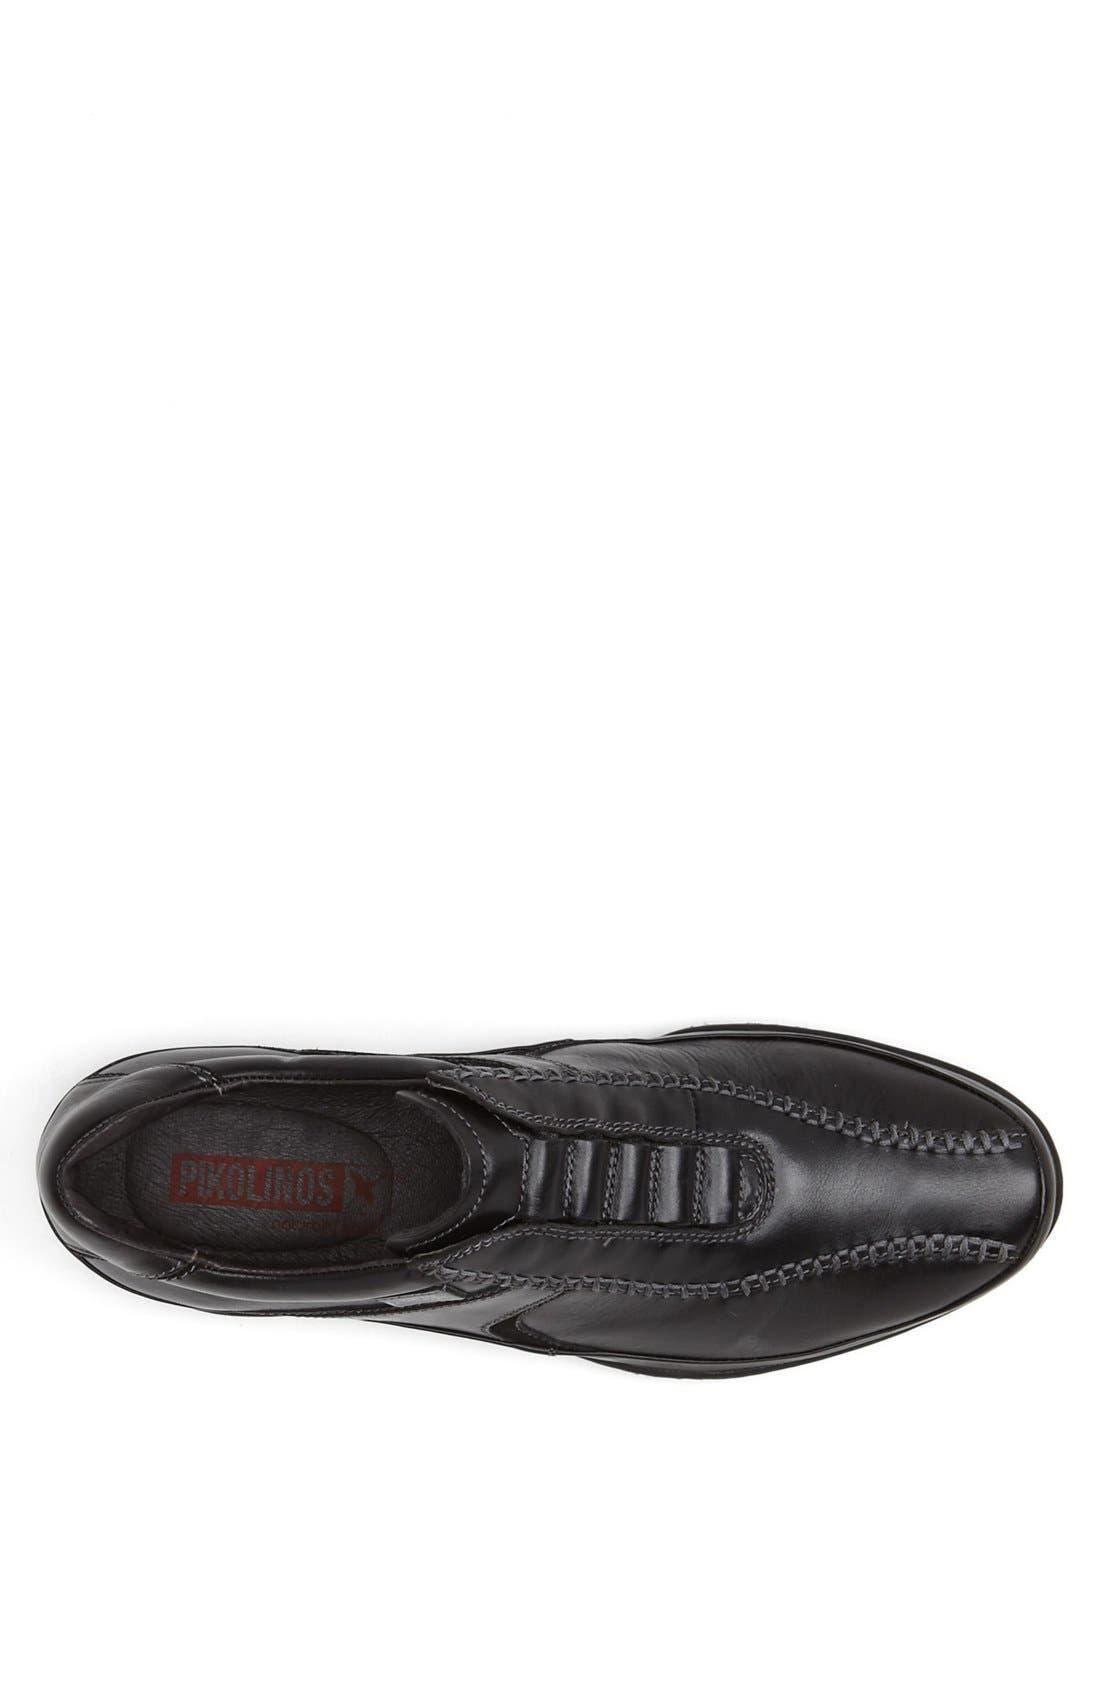 Alternate Image 3  - PIKOLINOS 'Suecia' Sneaker